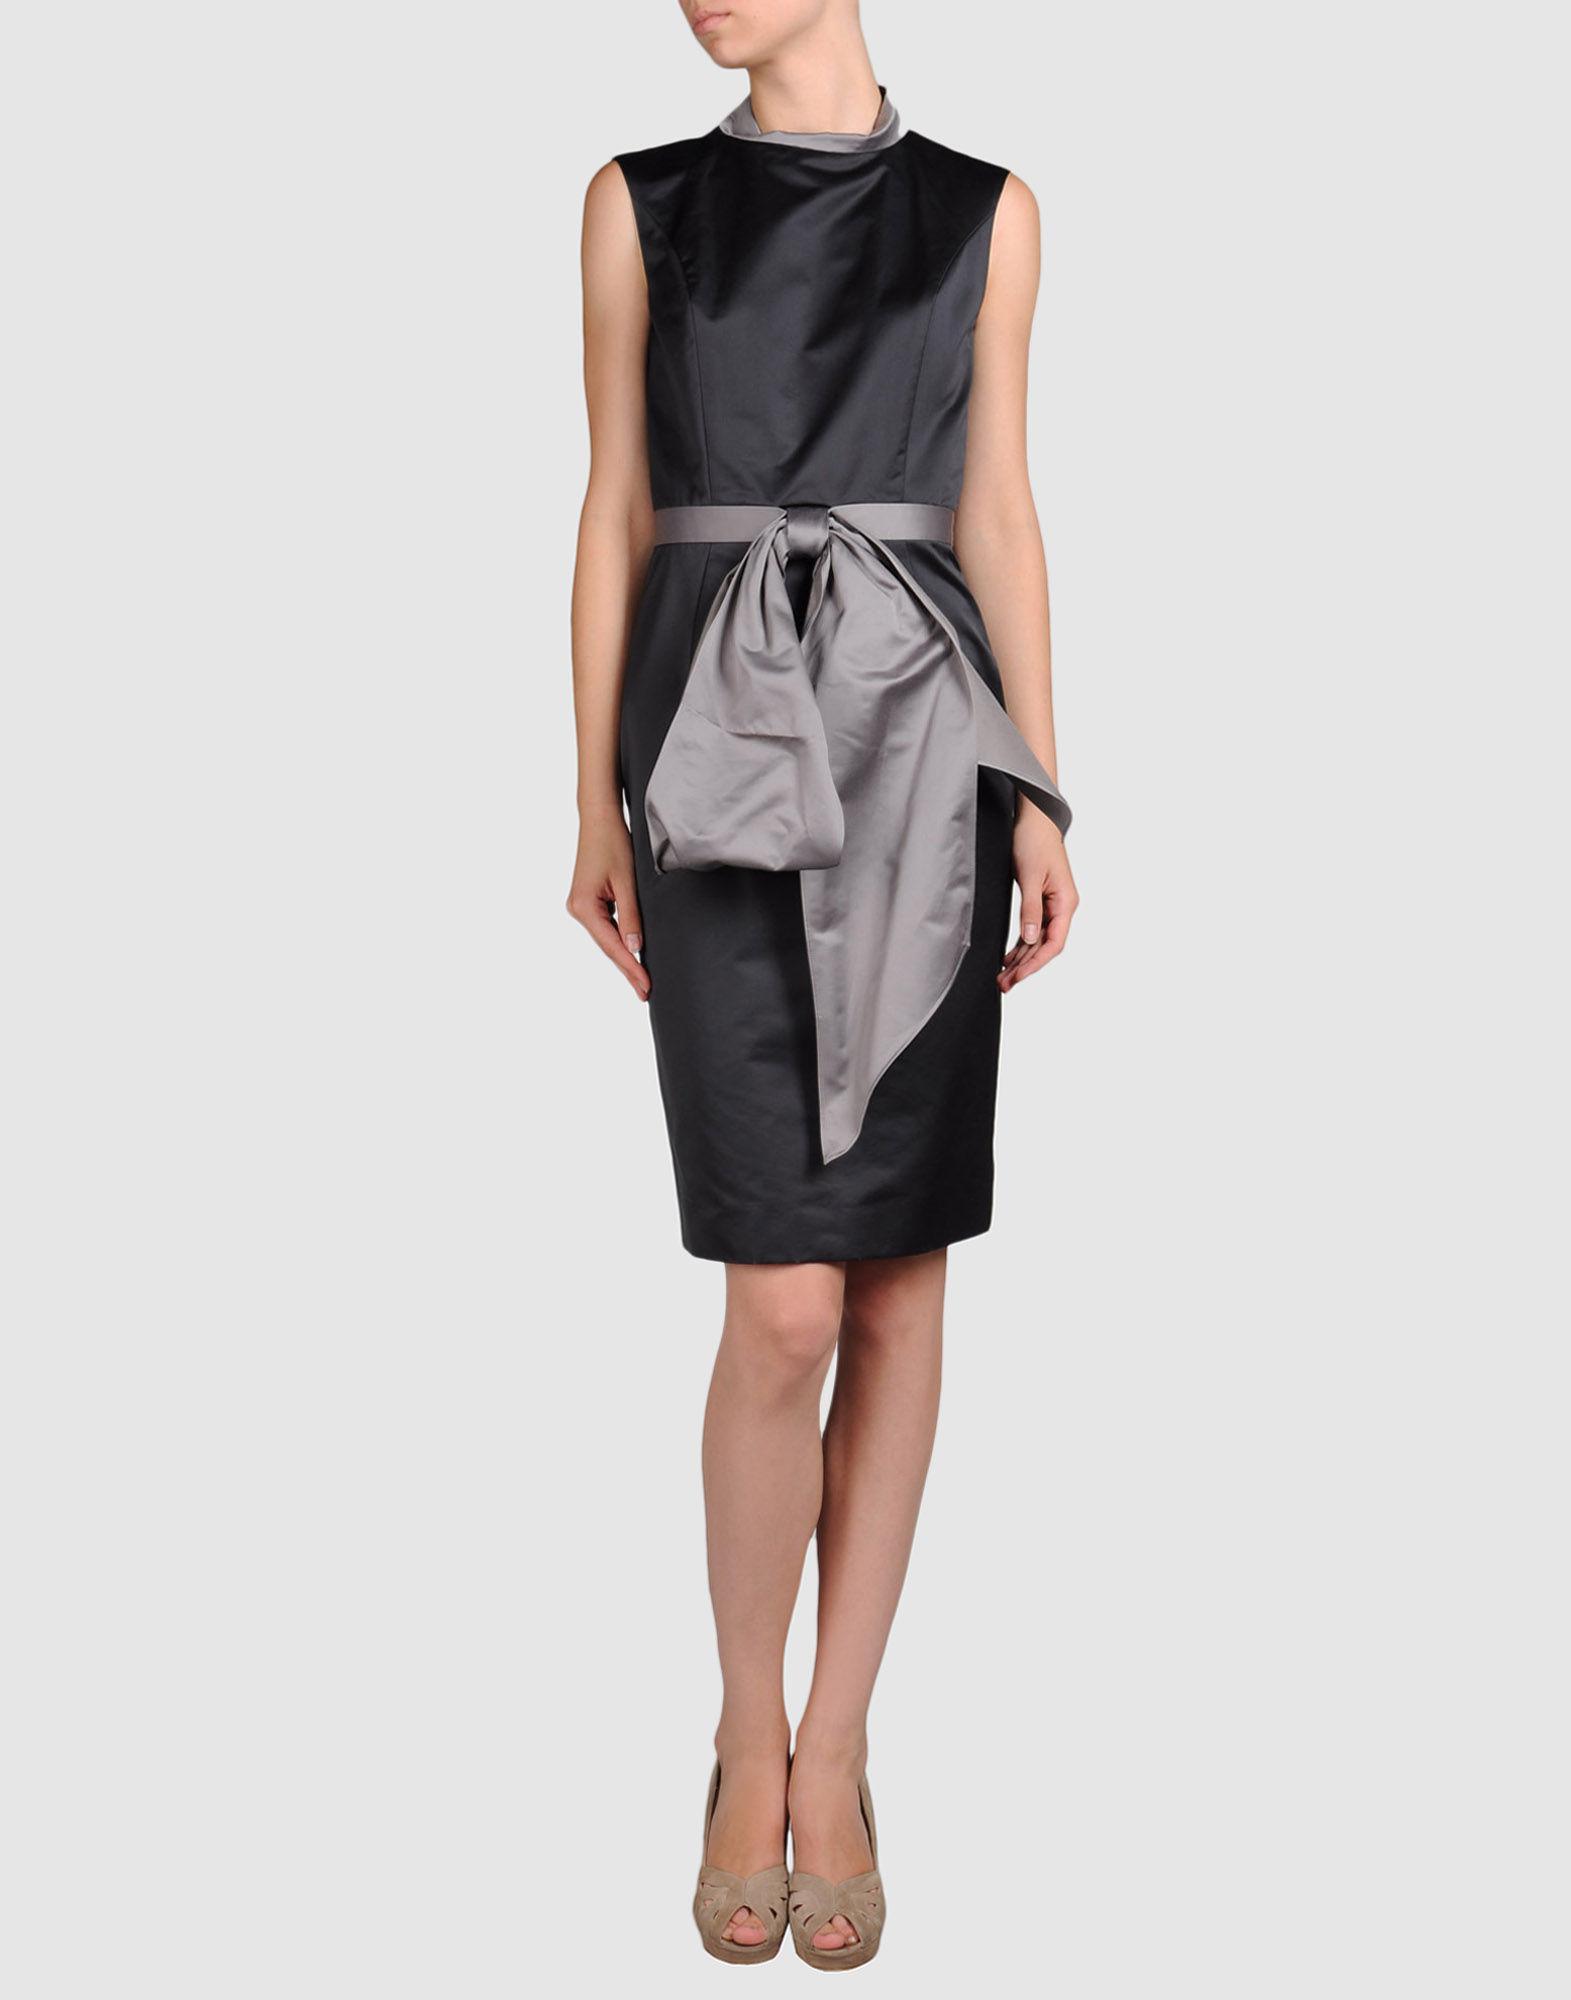 34219218QS 14 f - Βραδυνα Φορεματα Yves Saint Laurent Rive Gauche Κωδ.32